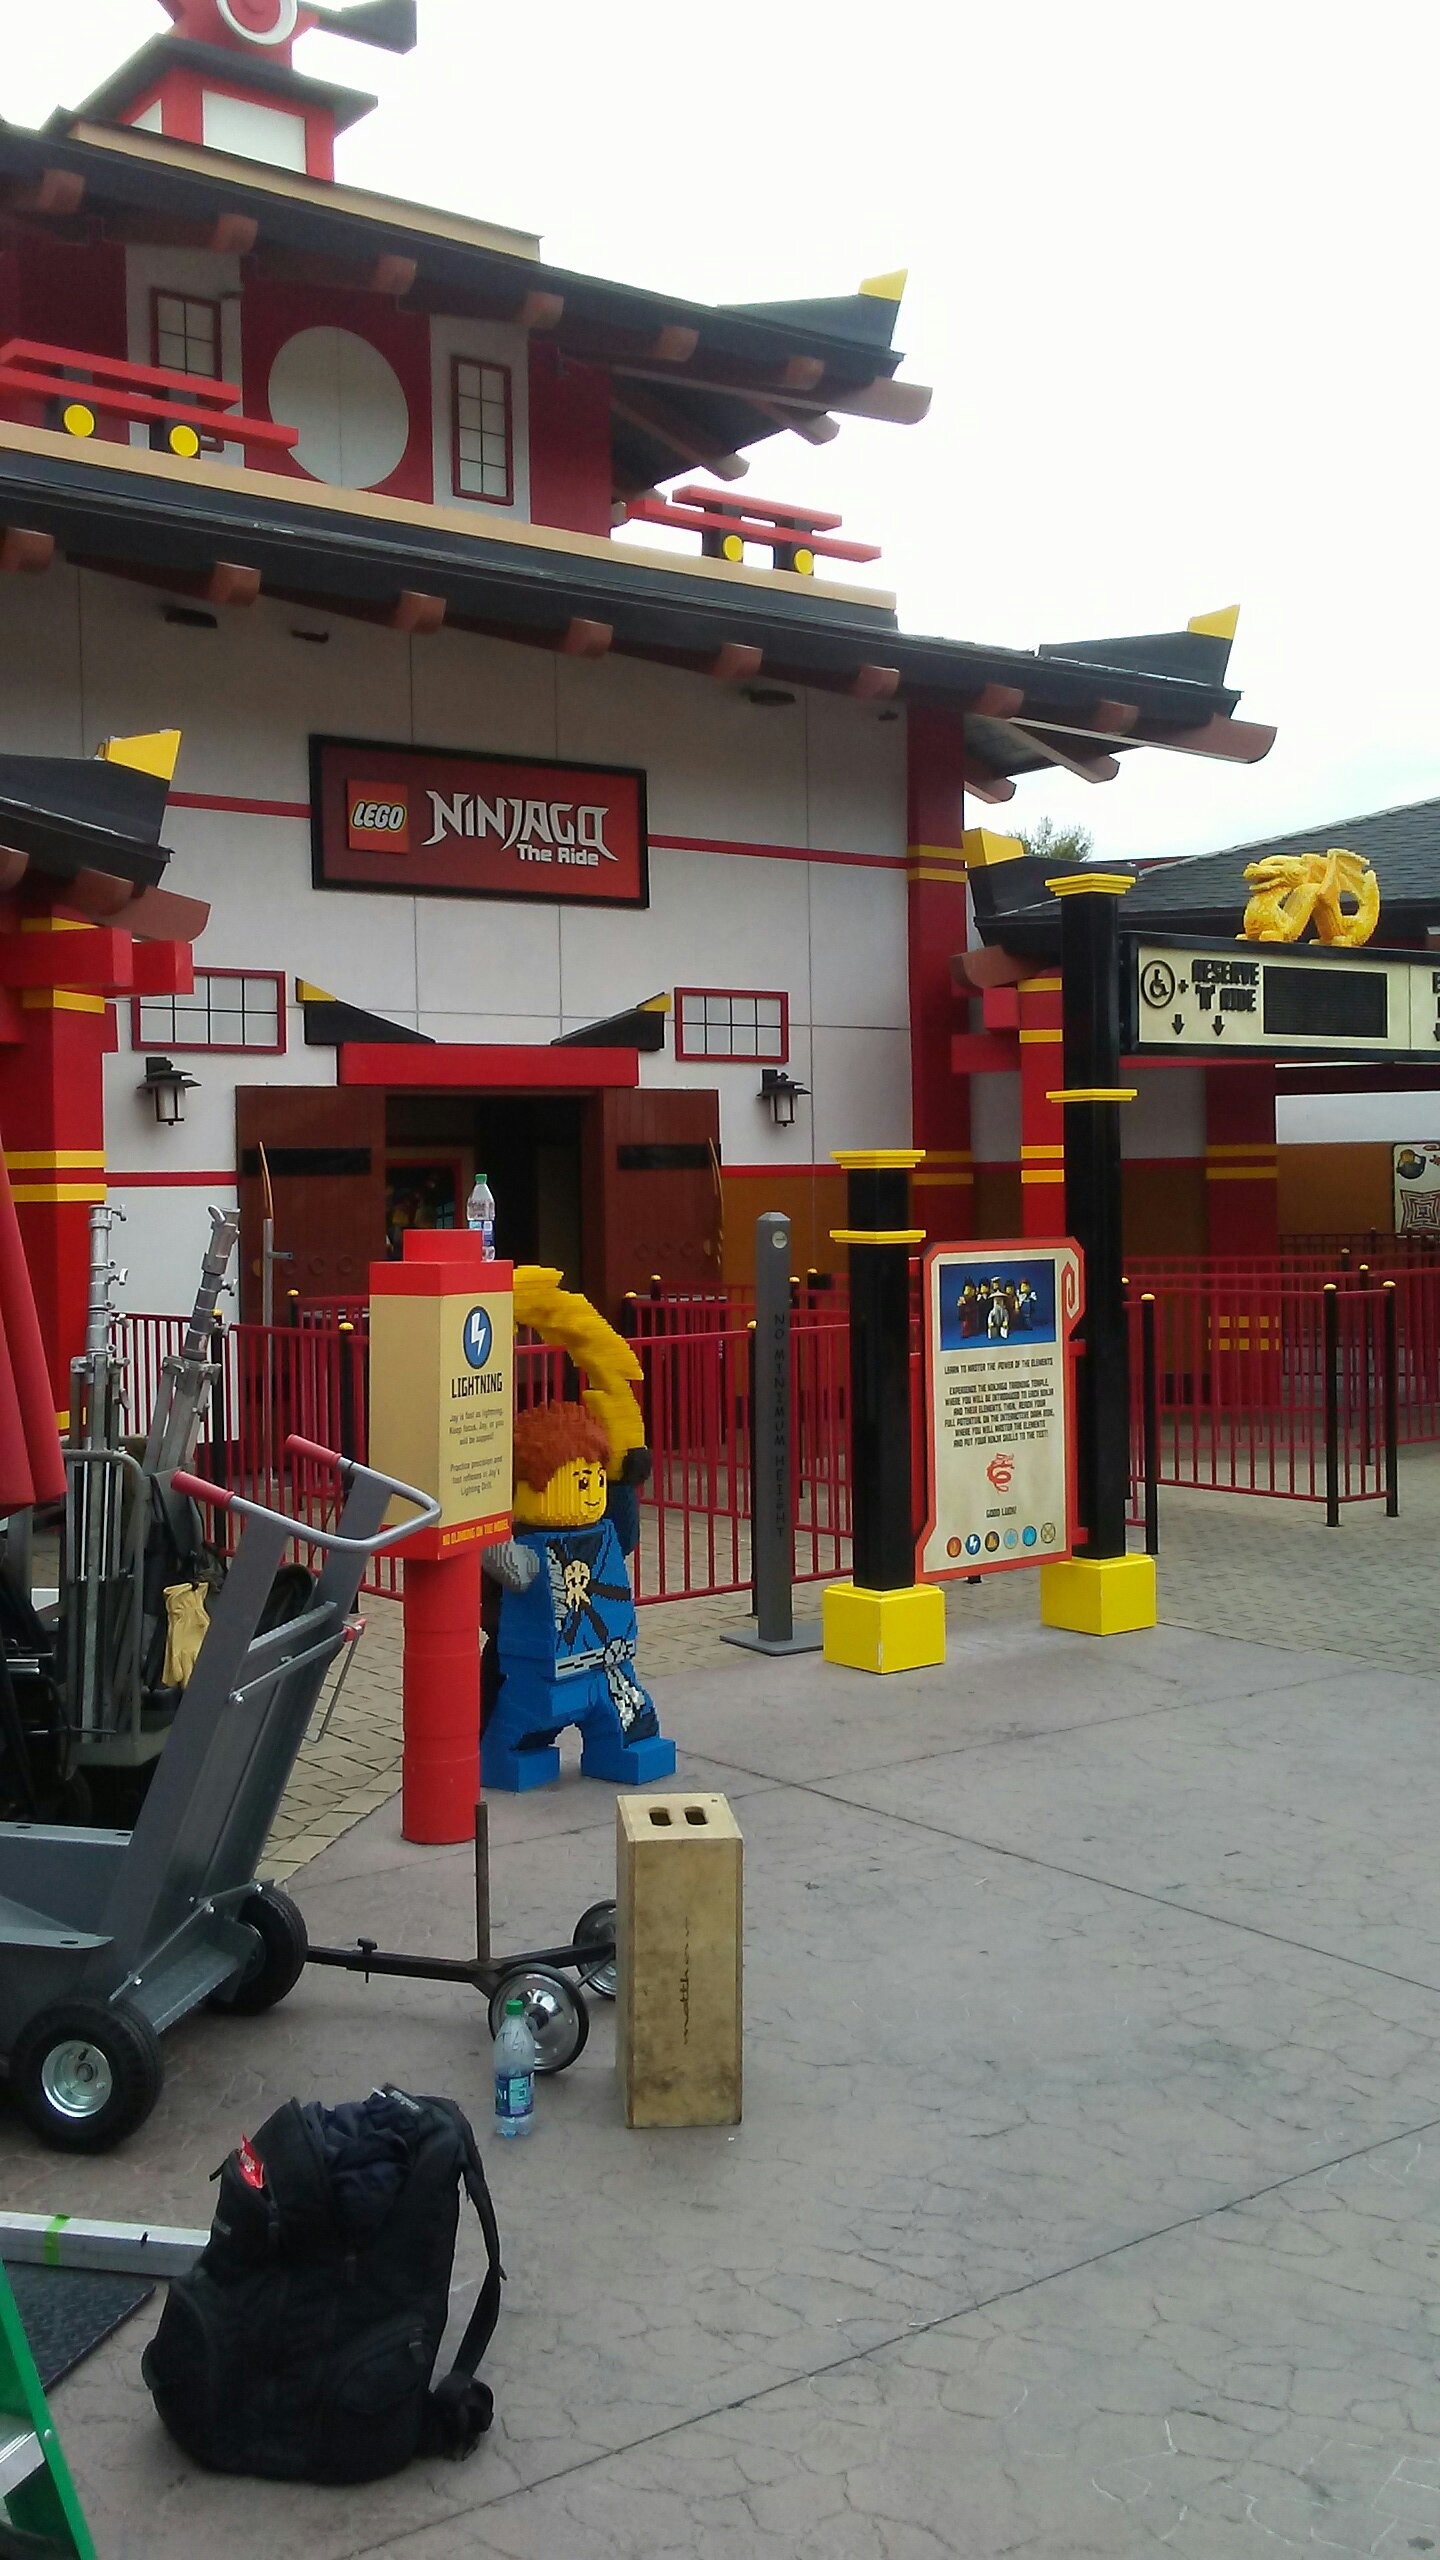 'The LEGO Ninjago Movie' Press Junket. September 14, 2017.